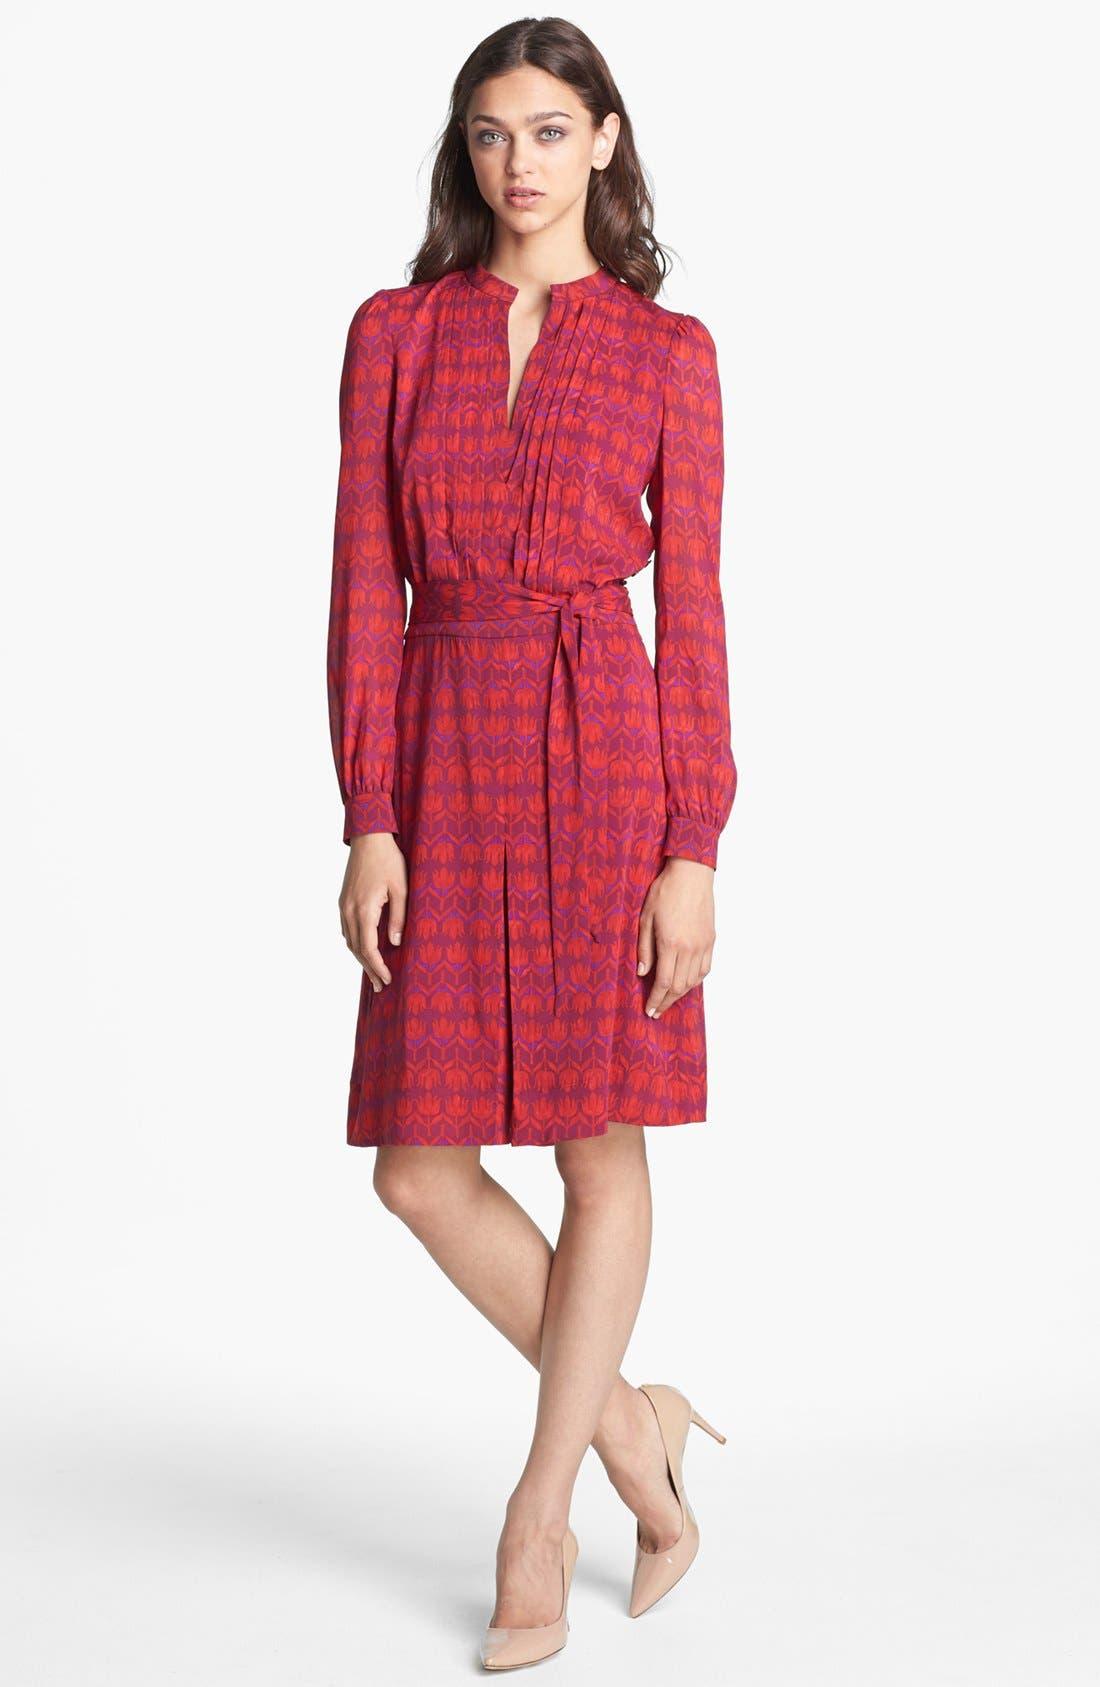 Alternate Image 1 Selected - Tory Burch 'Judi' Silk Shirtdress